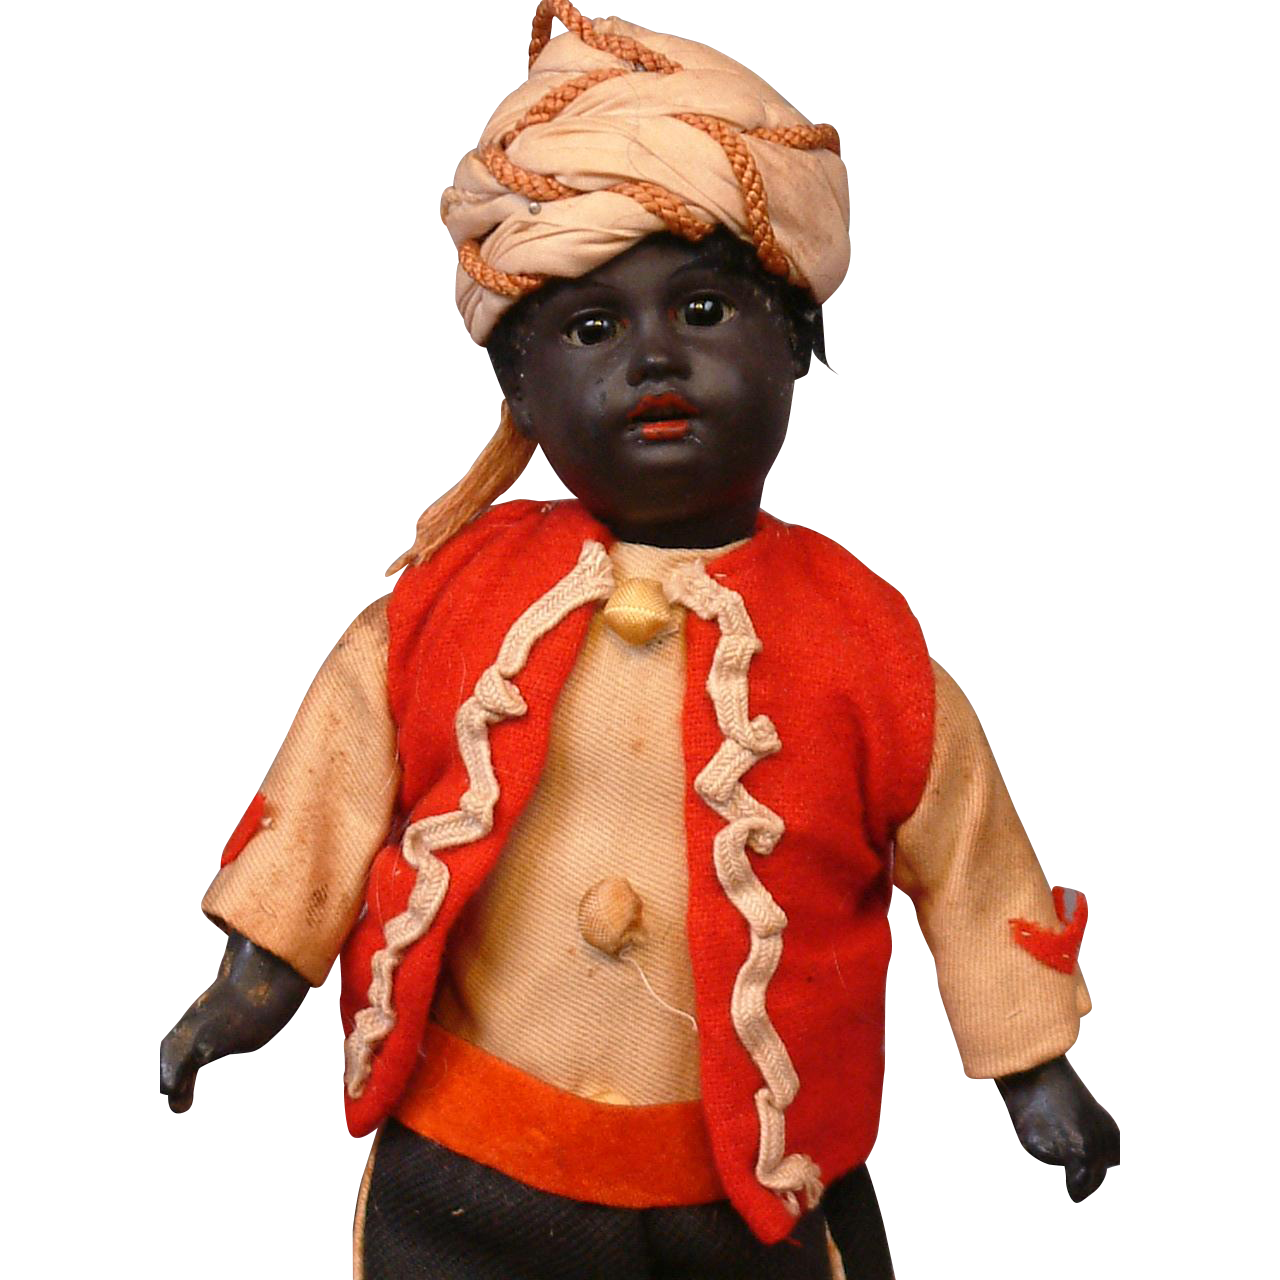 Delightful All Original Gebruder Kuhnlenz 34-20 Dressed As Moroccan Boy